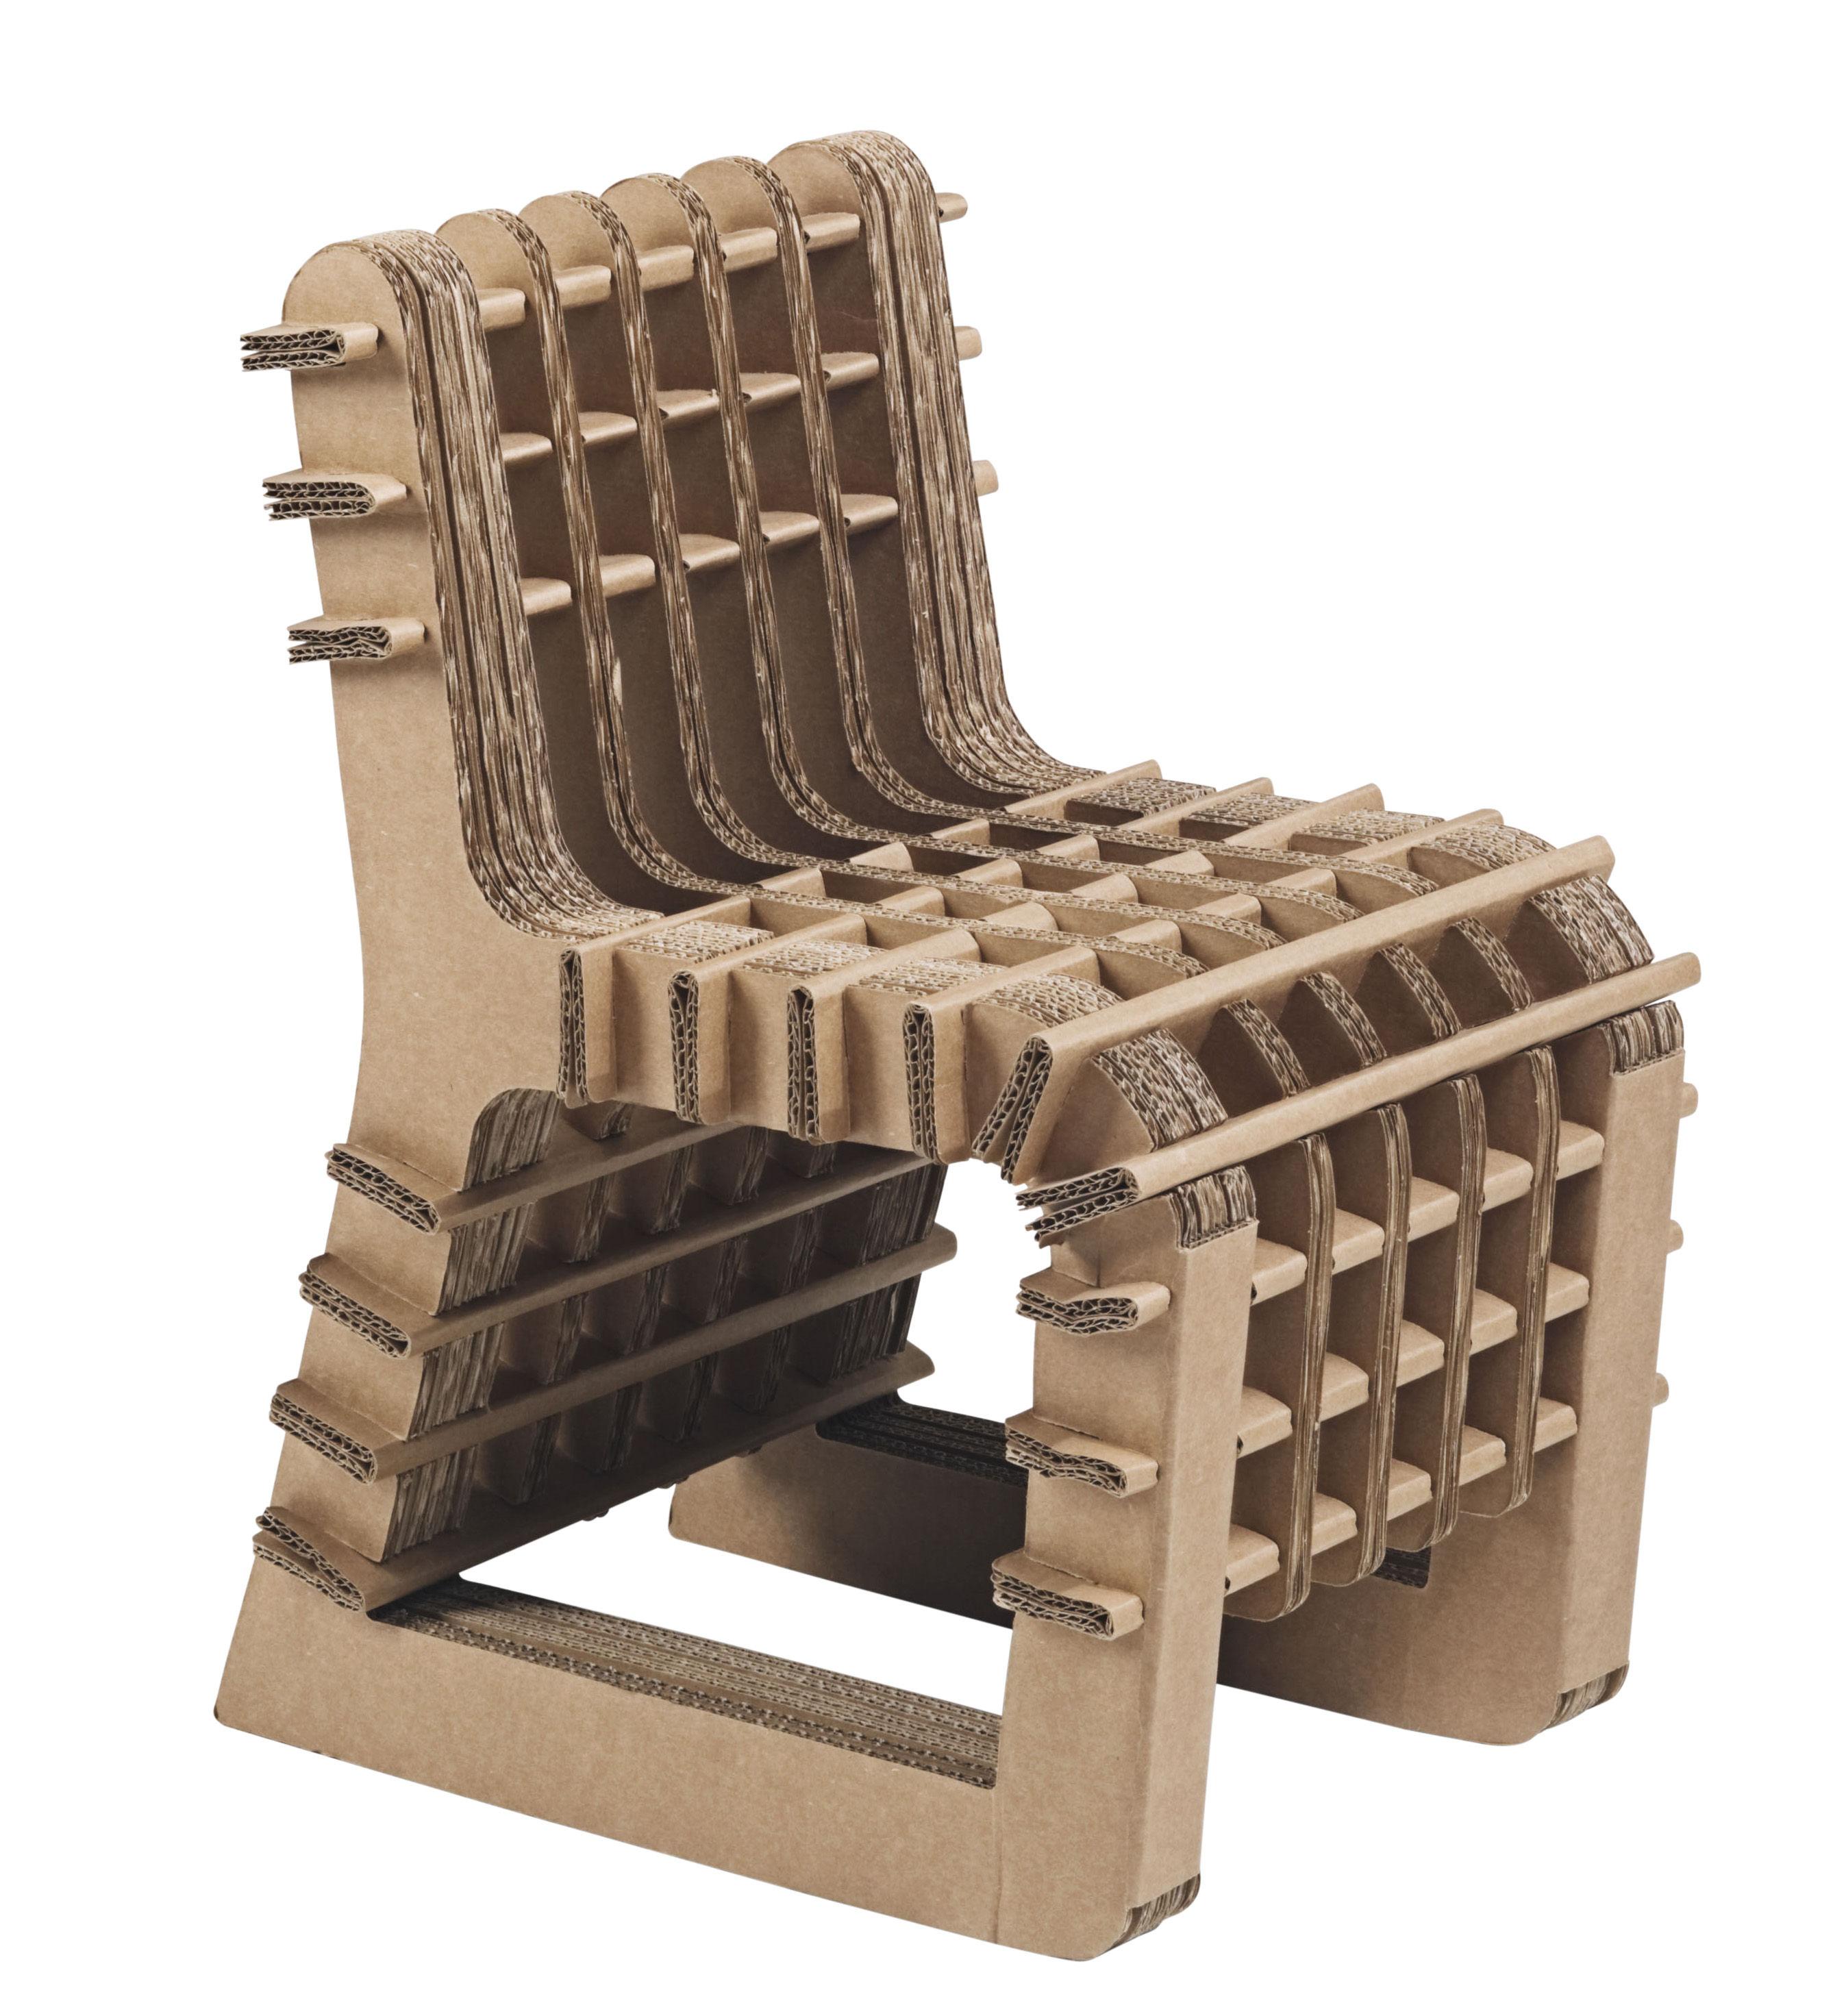 build up kinderstuhl pappe by skitsch | made in design